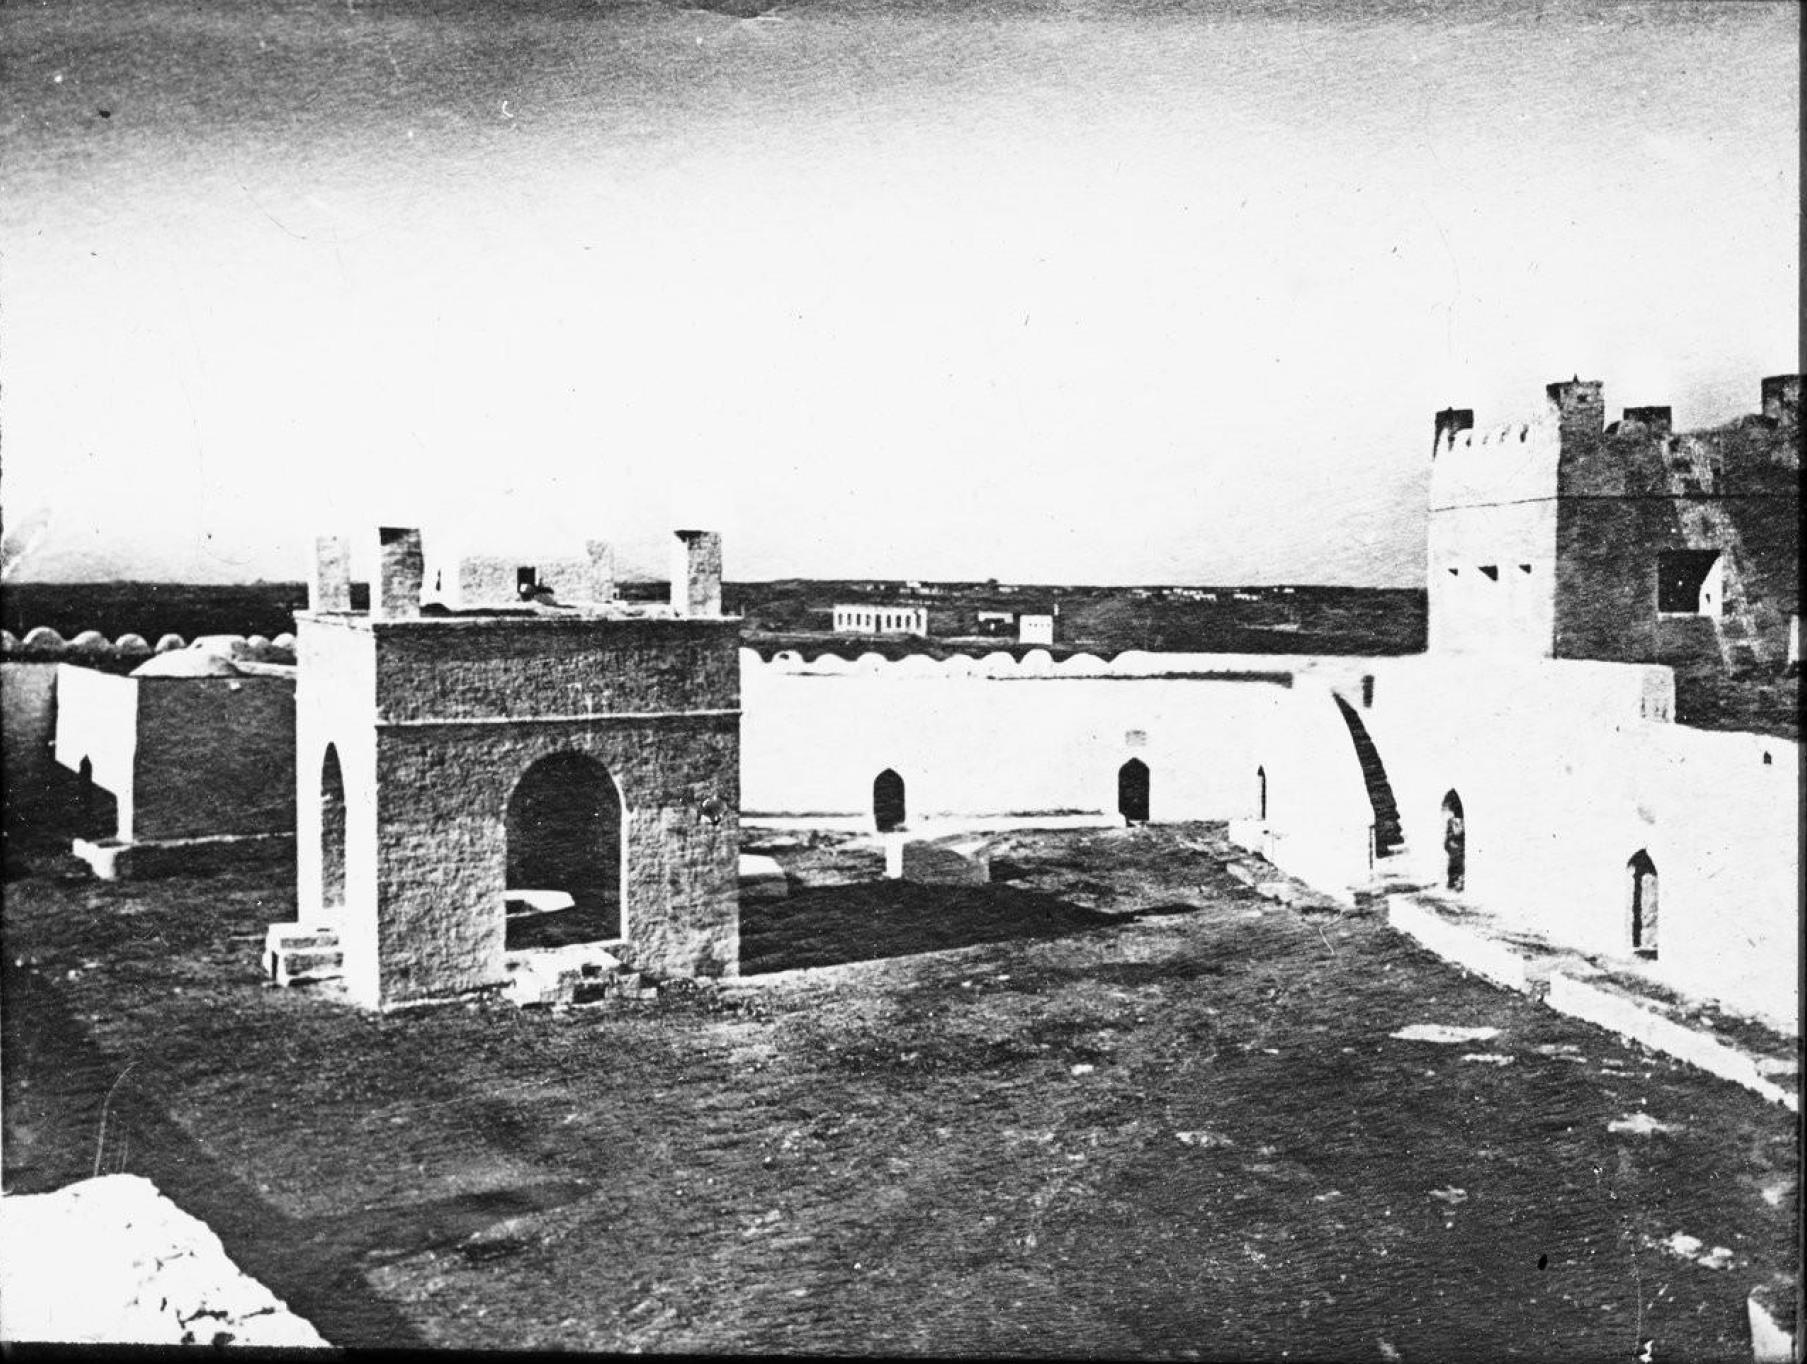 Баку. Храм огнепоклонников